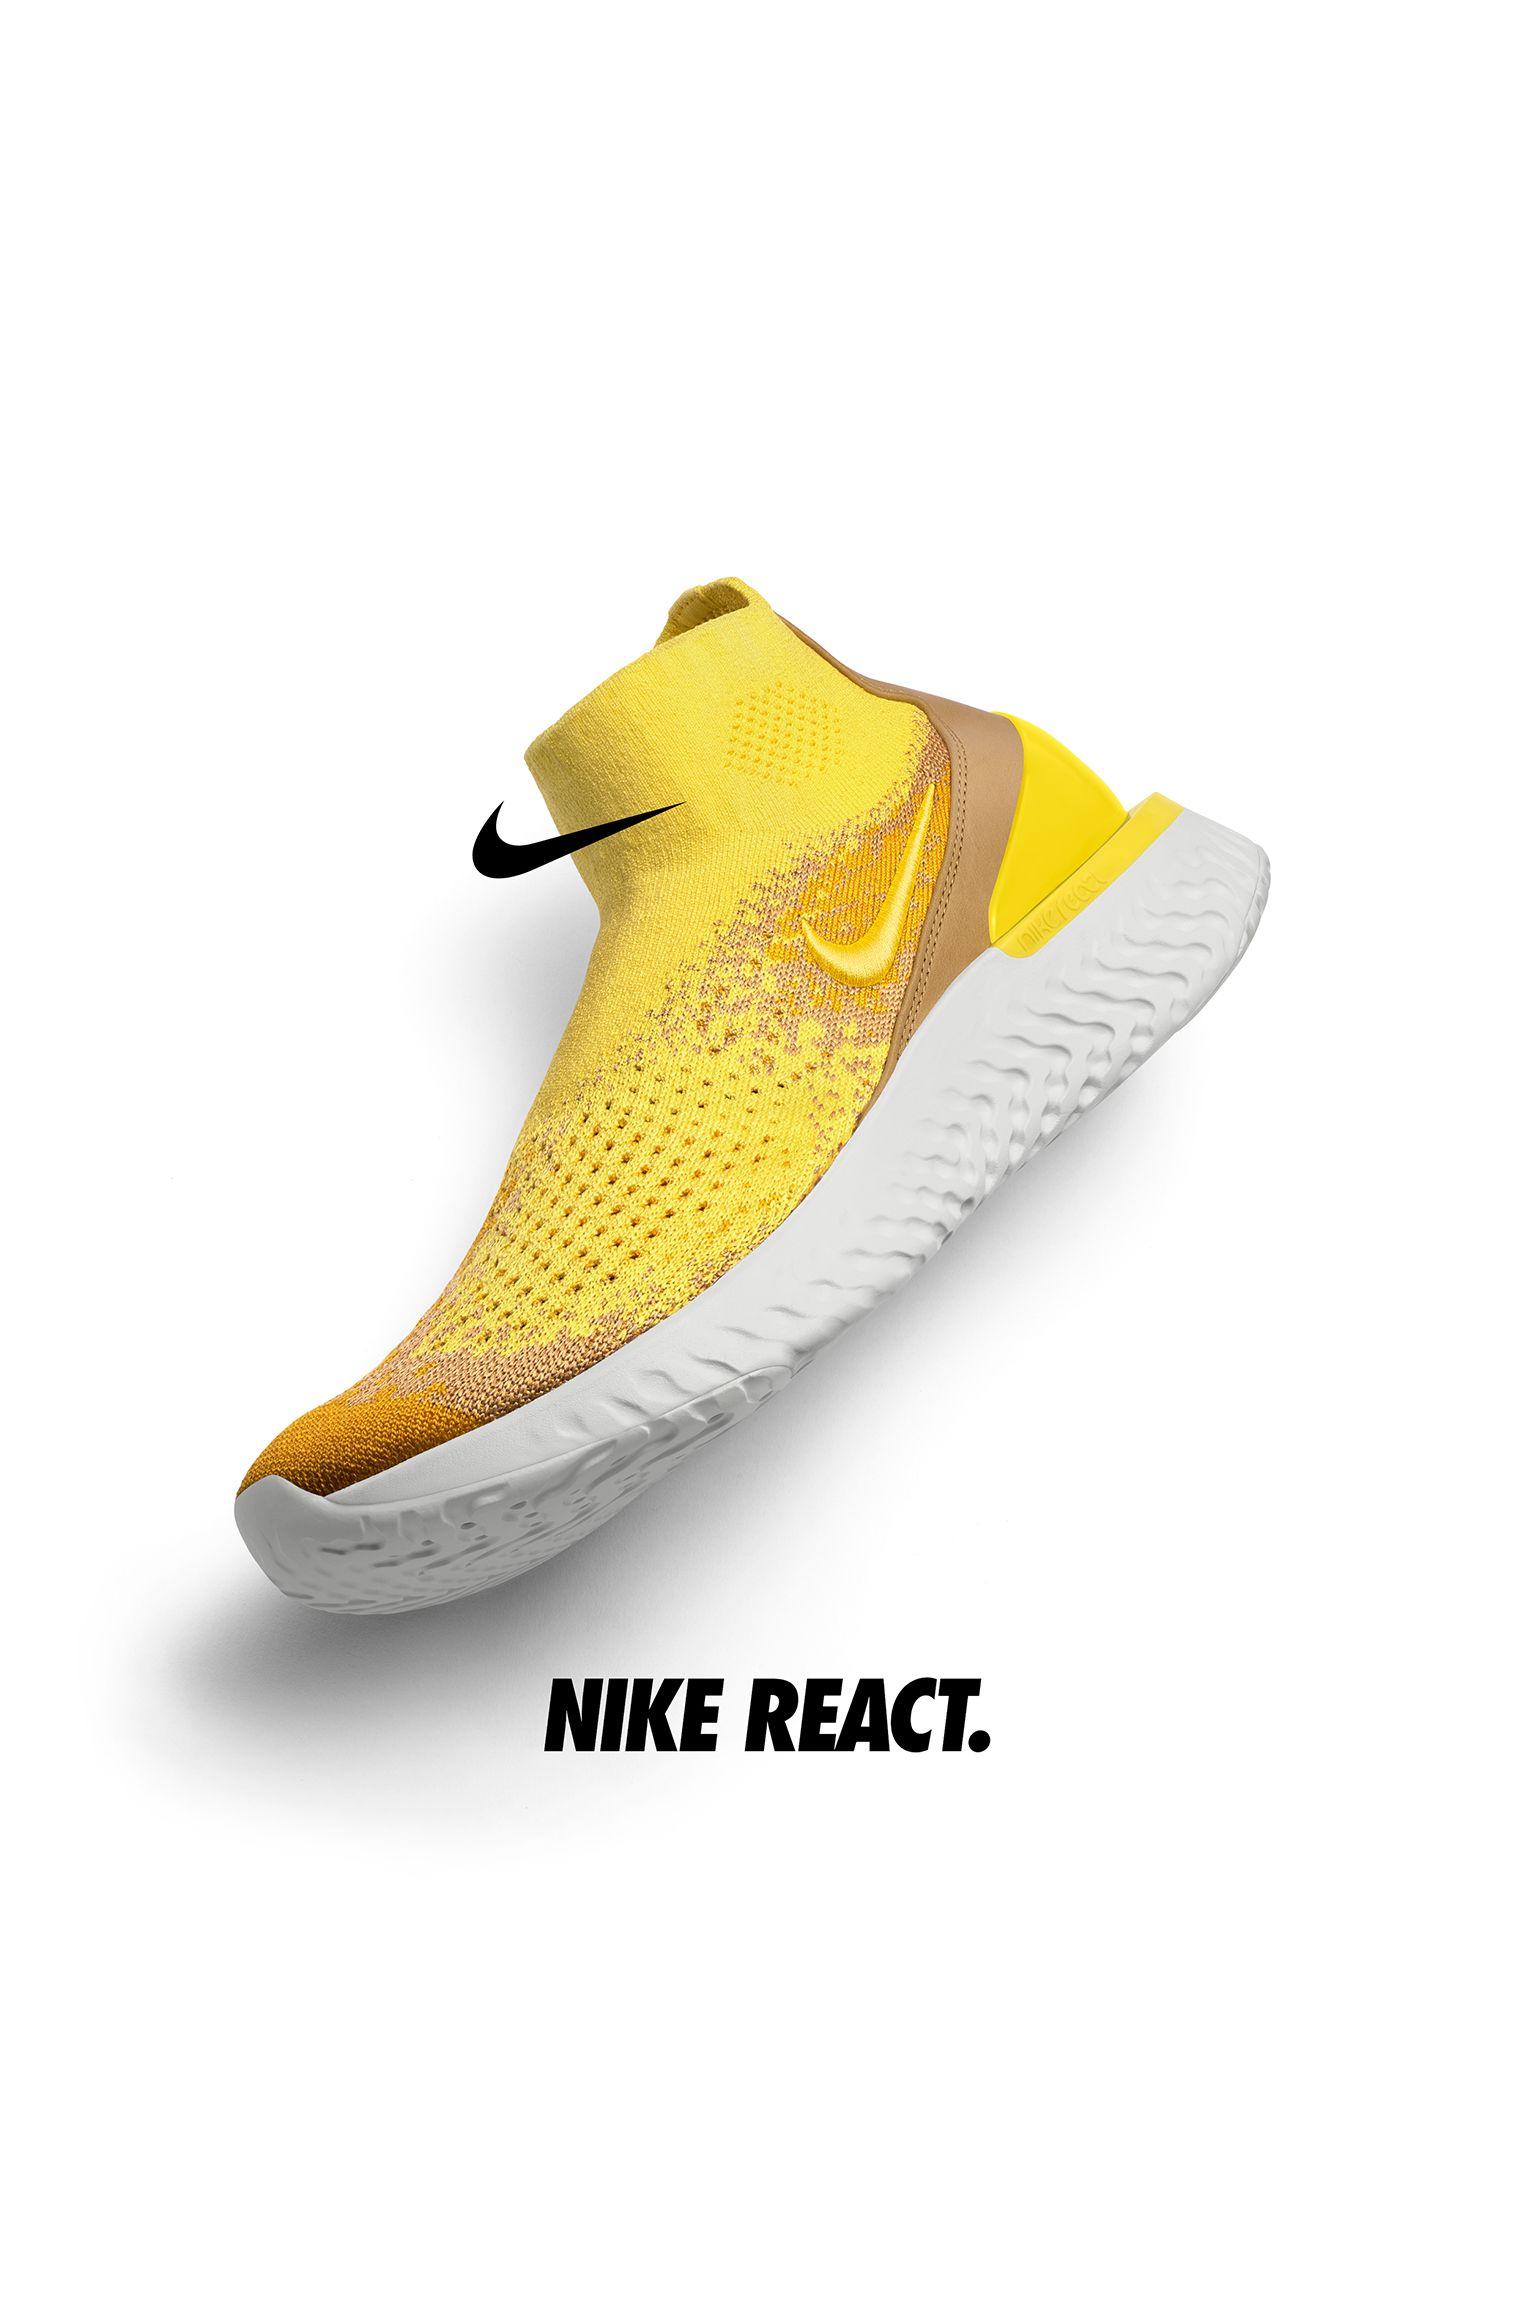 【NIKE公式】ナイキ ライズ リアクト 'Sonic Yellow and Dark Stucco' (BQ6176-707 / Rise React )